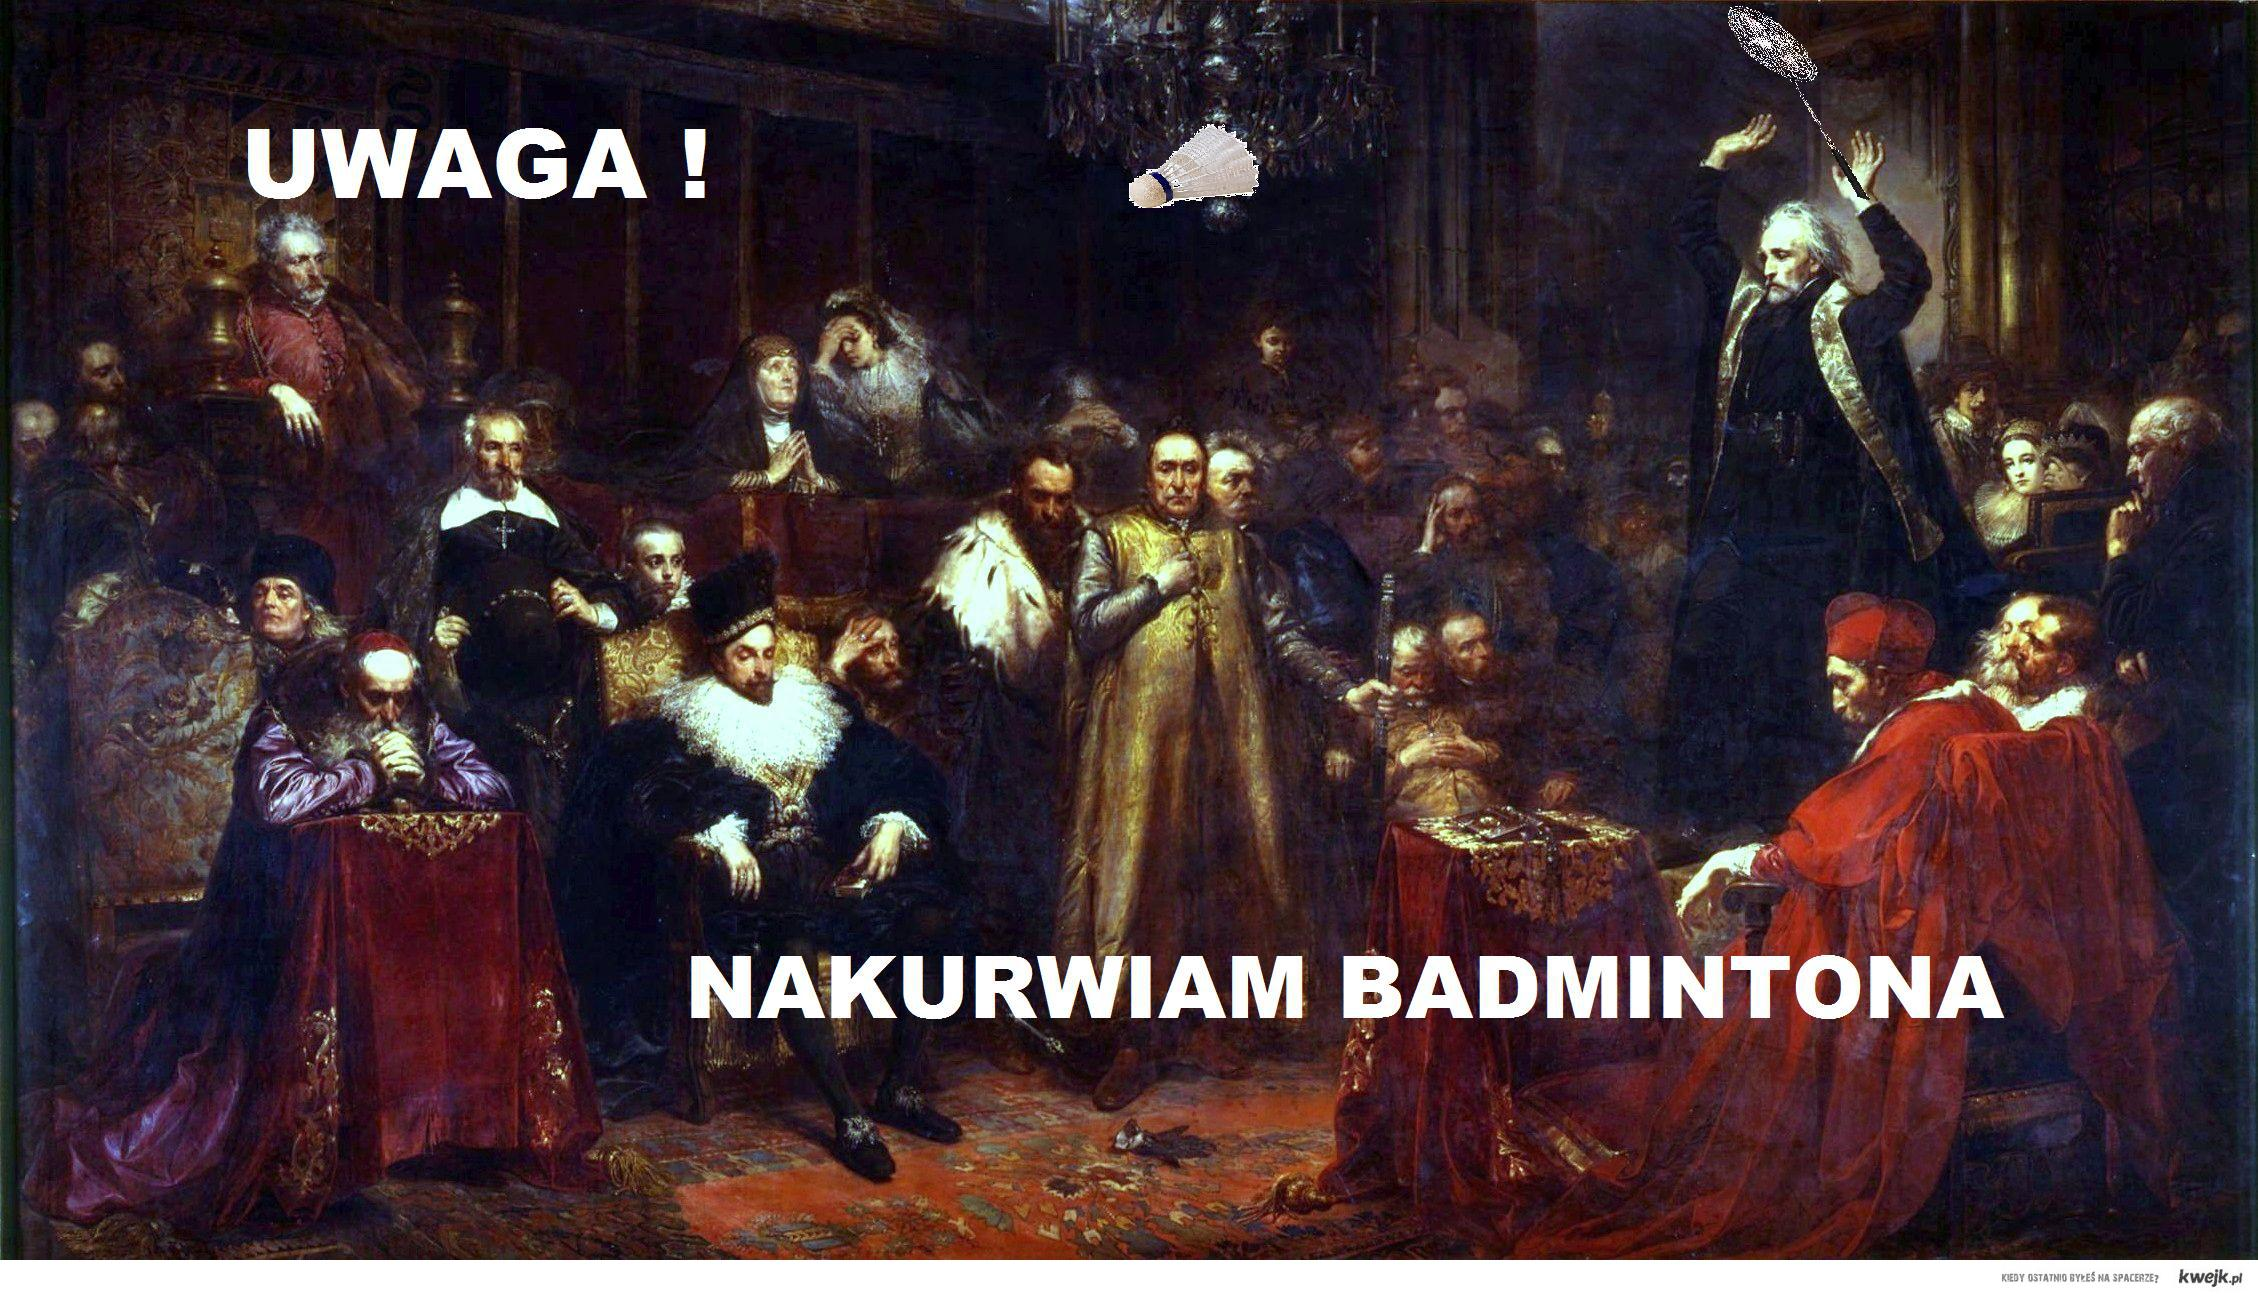 nakurwiam badmintona